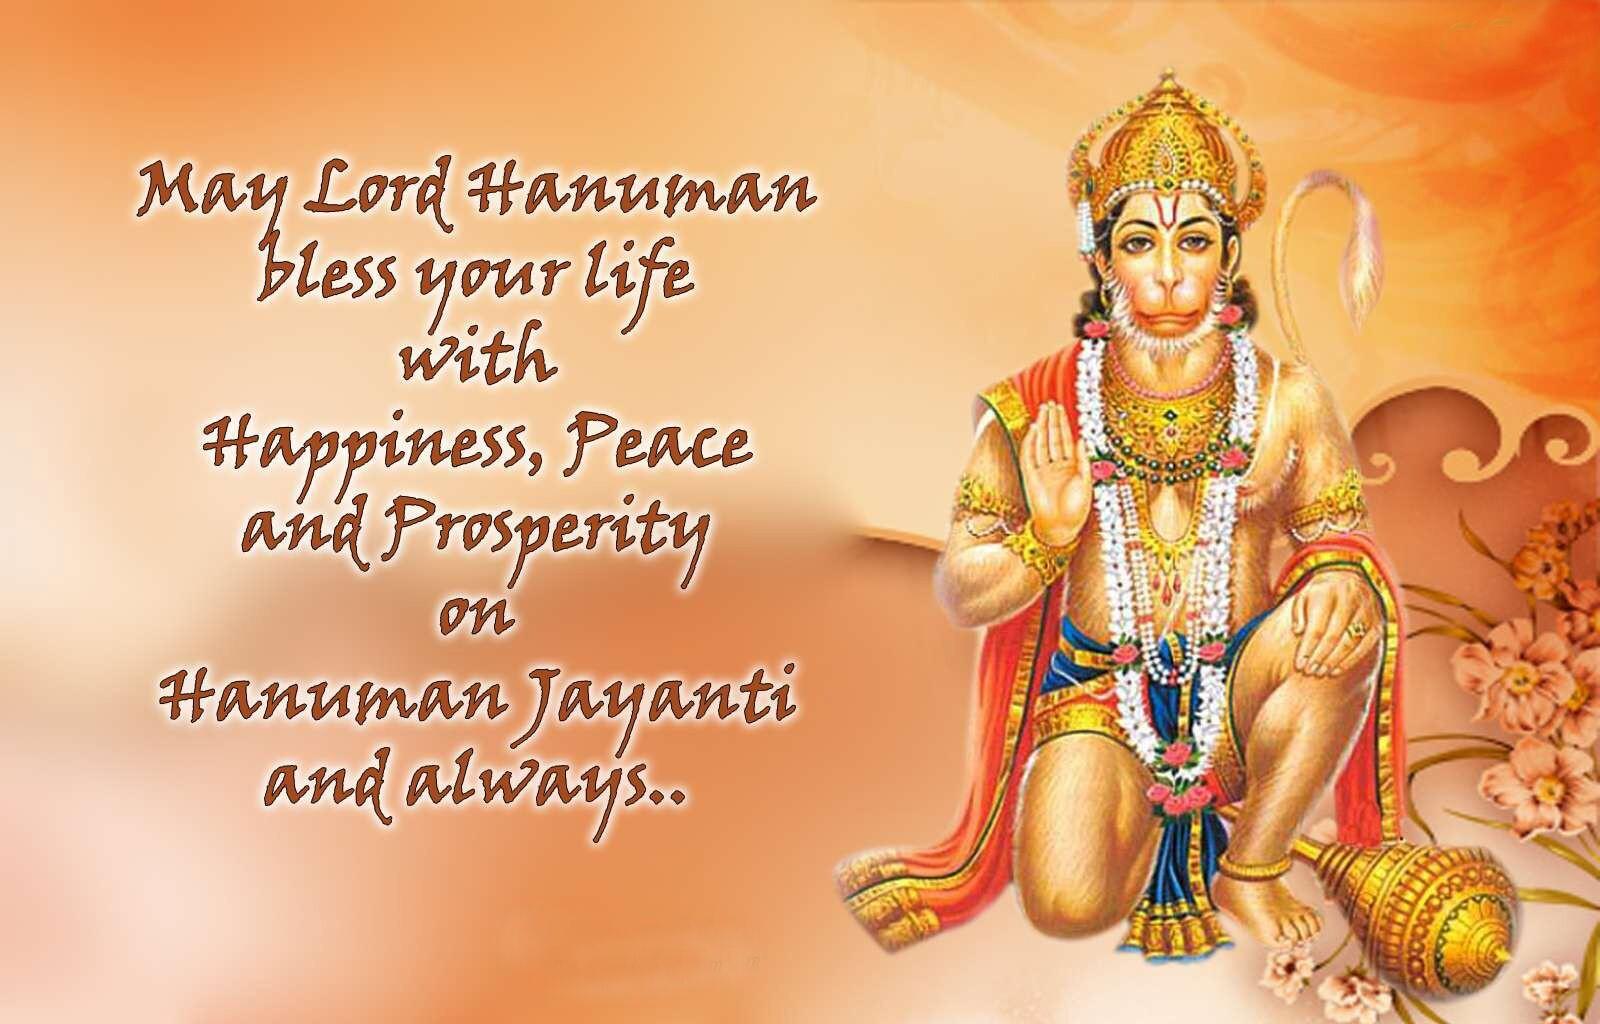 Happy Hanuman Jayanti Greeting Quote Wallpaper Hd Wallpapers